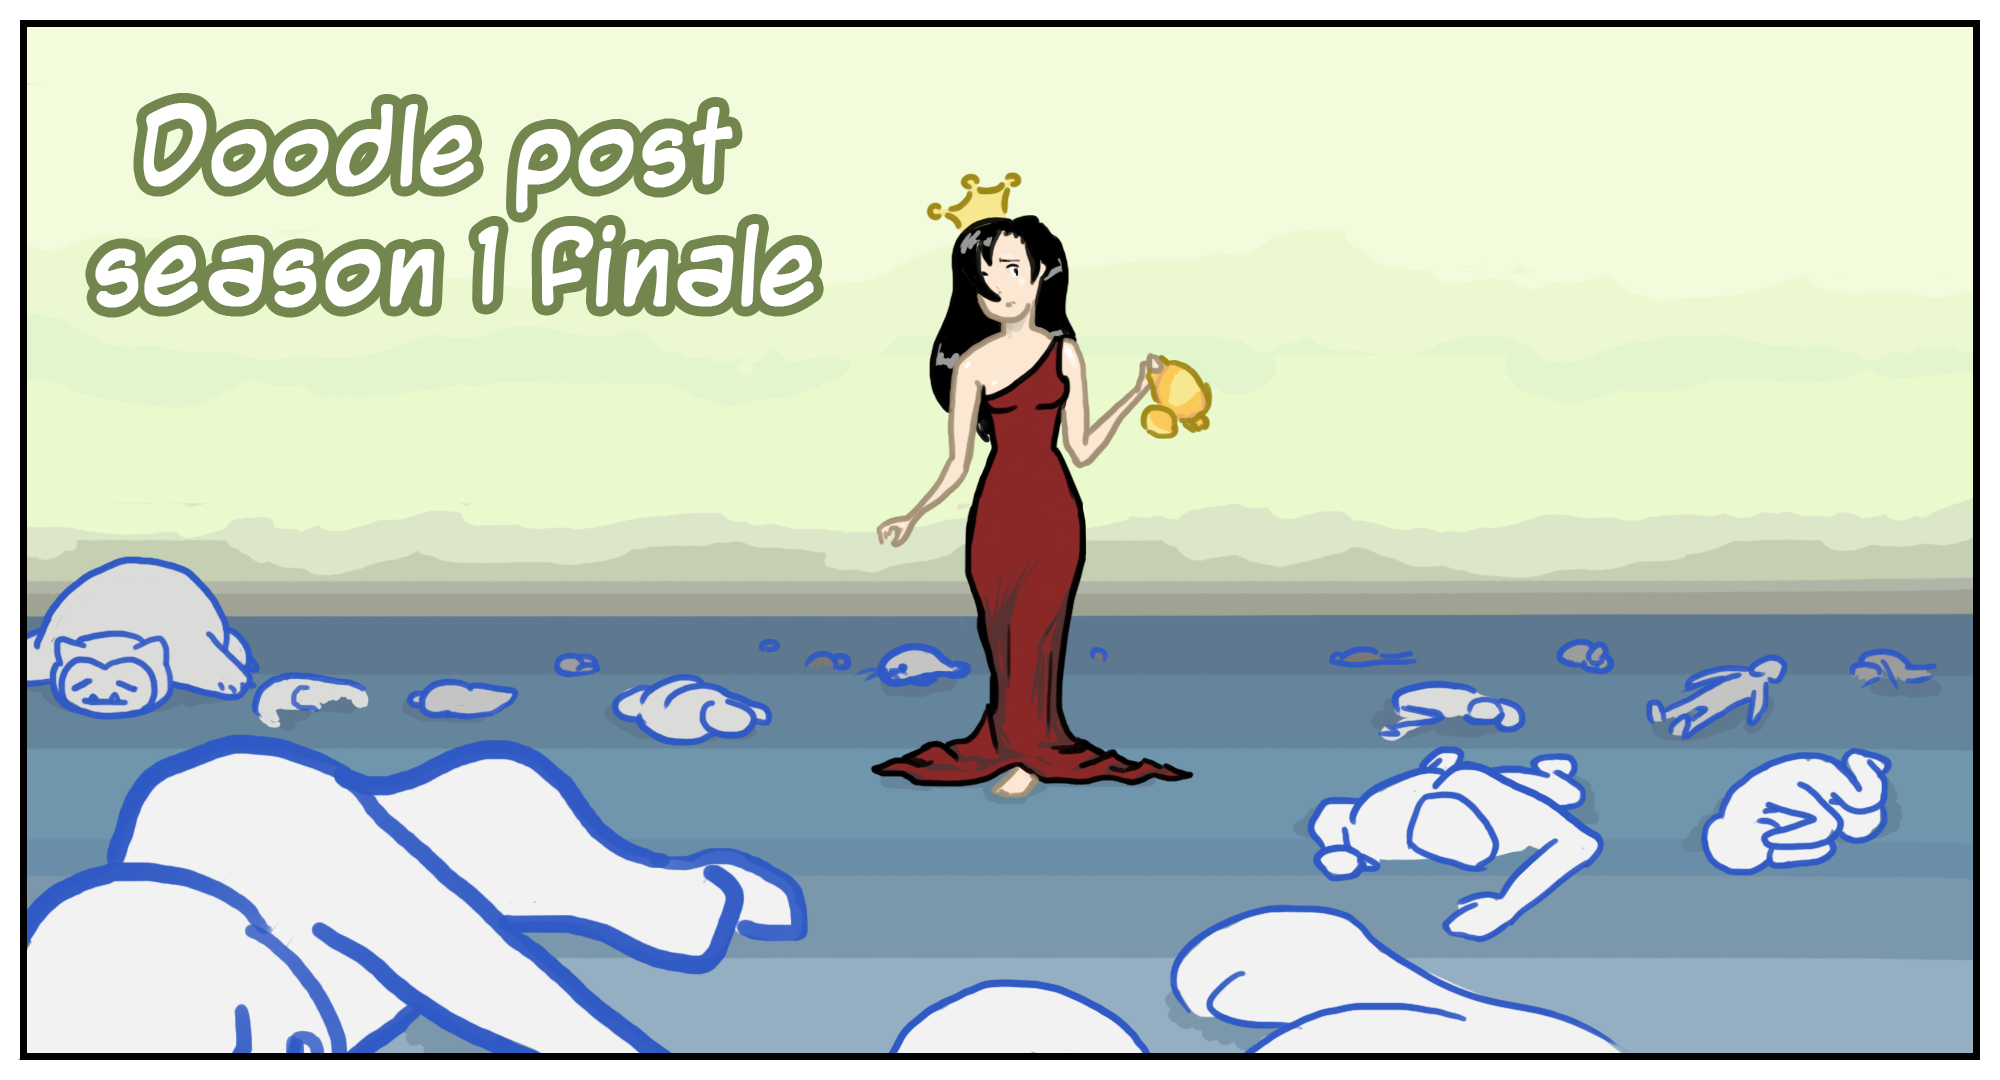 Doodle post season finale +диаграмма. - Изображение 1